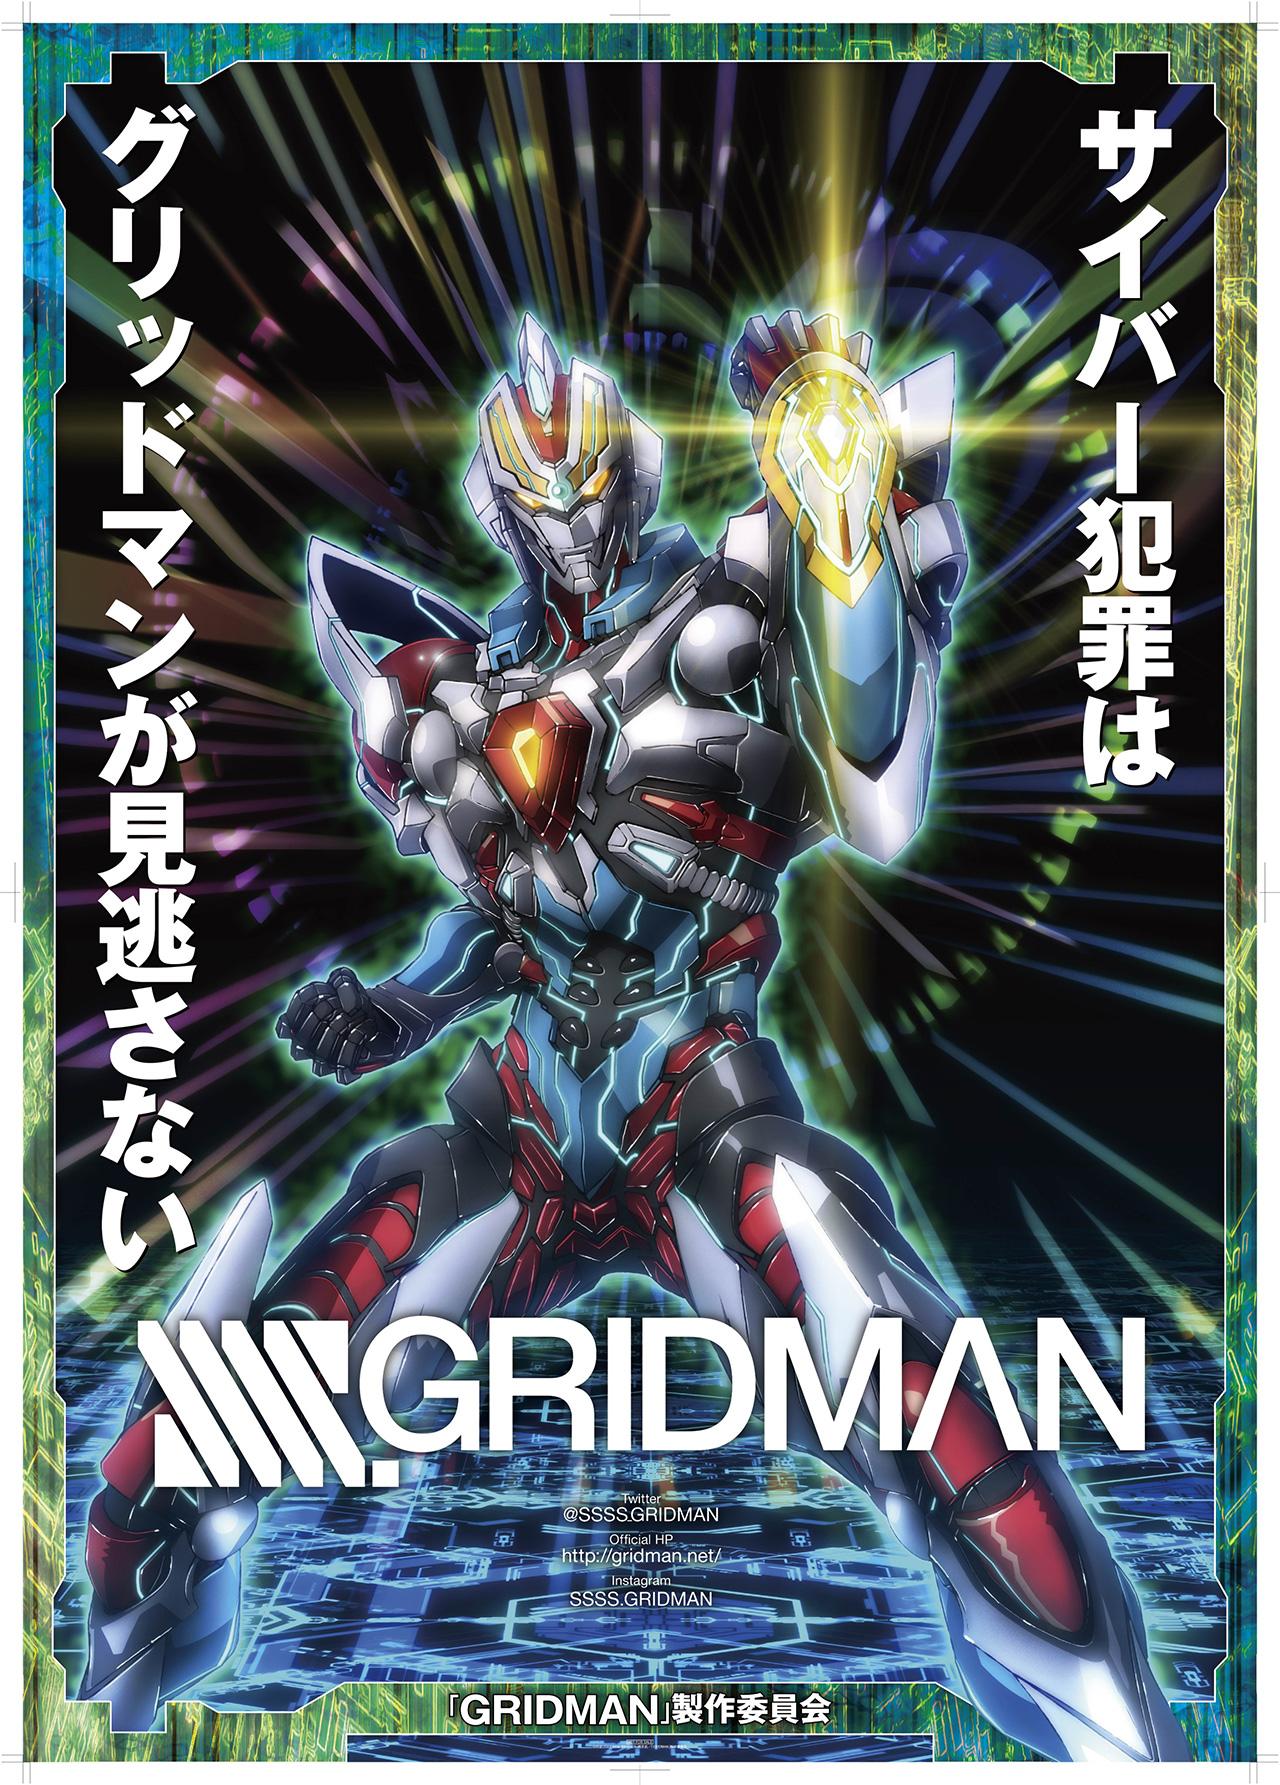 SSSS.GRIDMAN promove cibersegurança no Japão